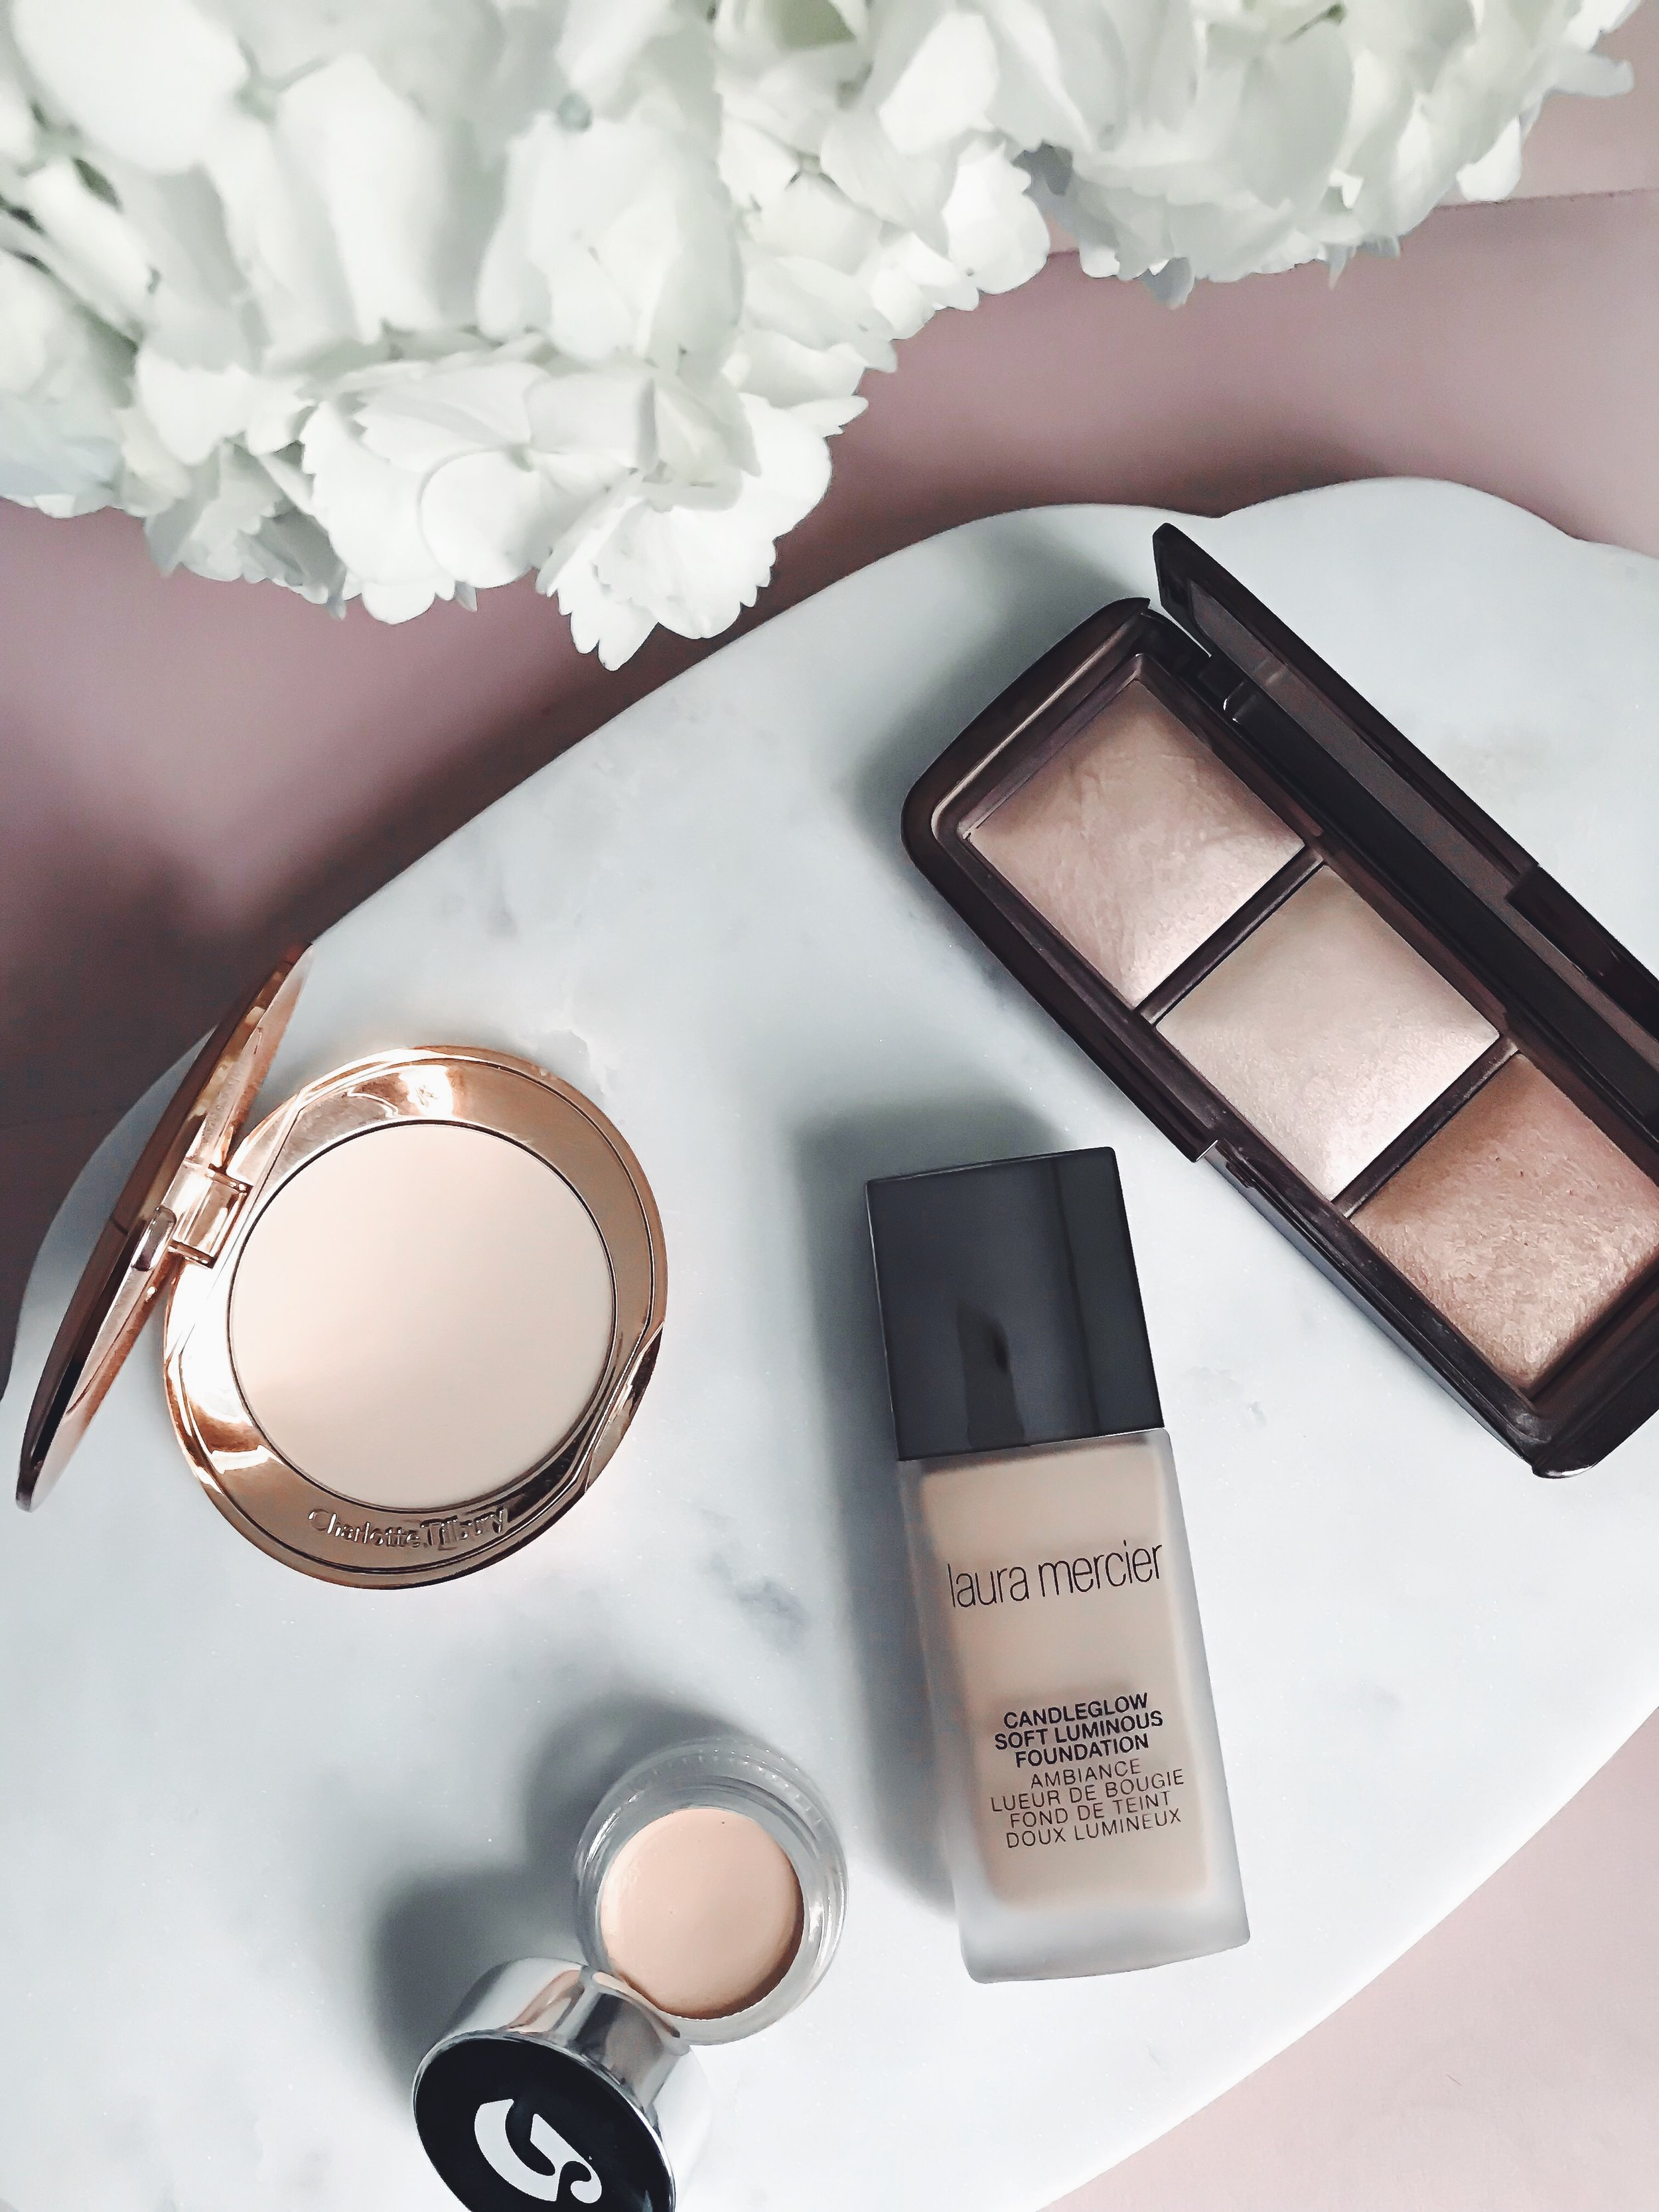 Recent Beauty Buys | Pine Barren Beauty | Laura Mercier foundation, Charlotte Tilbury setting powder, Glossier concealer, Hourglass ambient light palette, beauty product review, beauty product flat lay